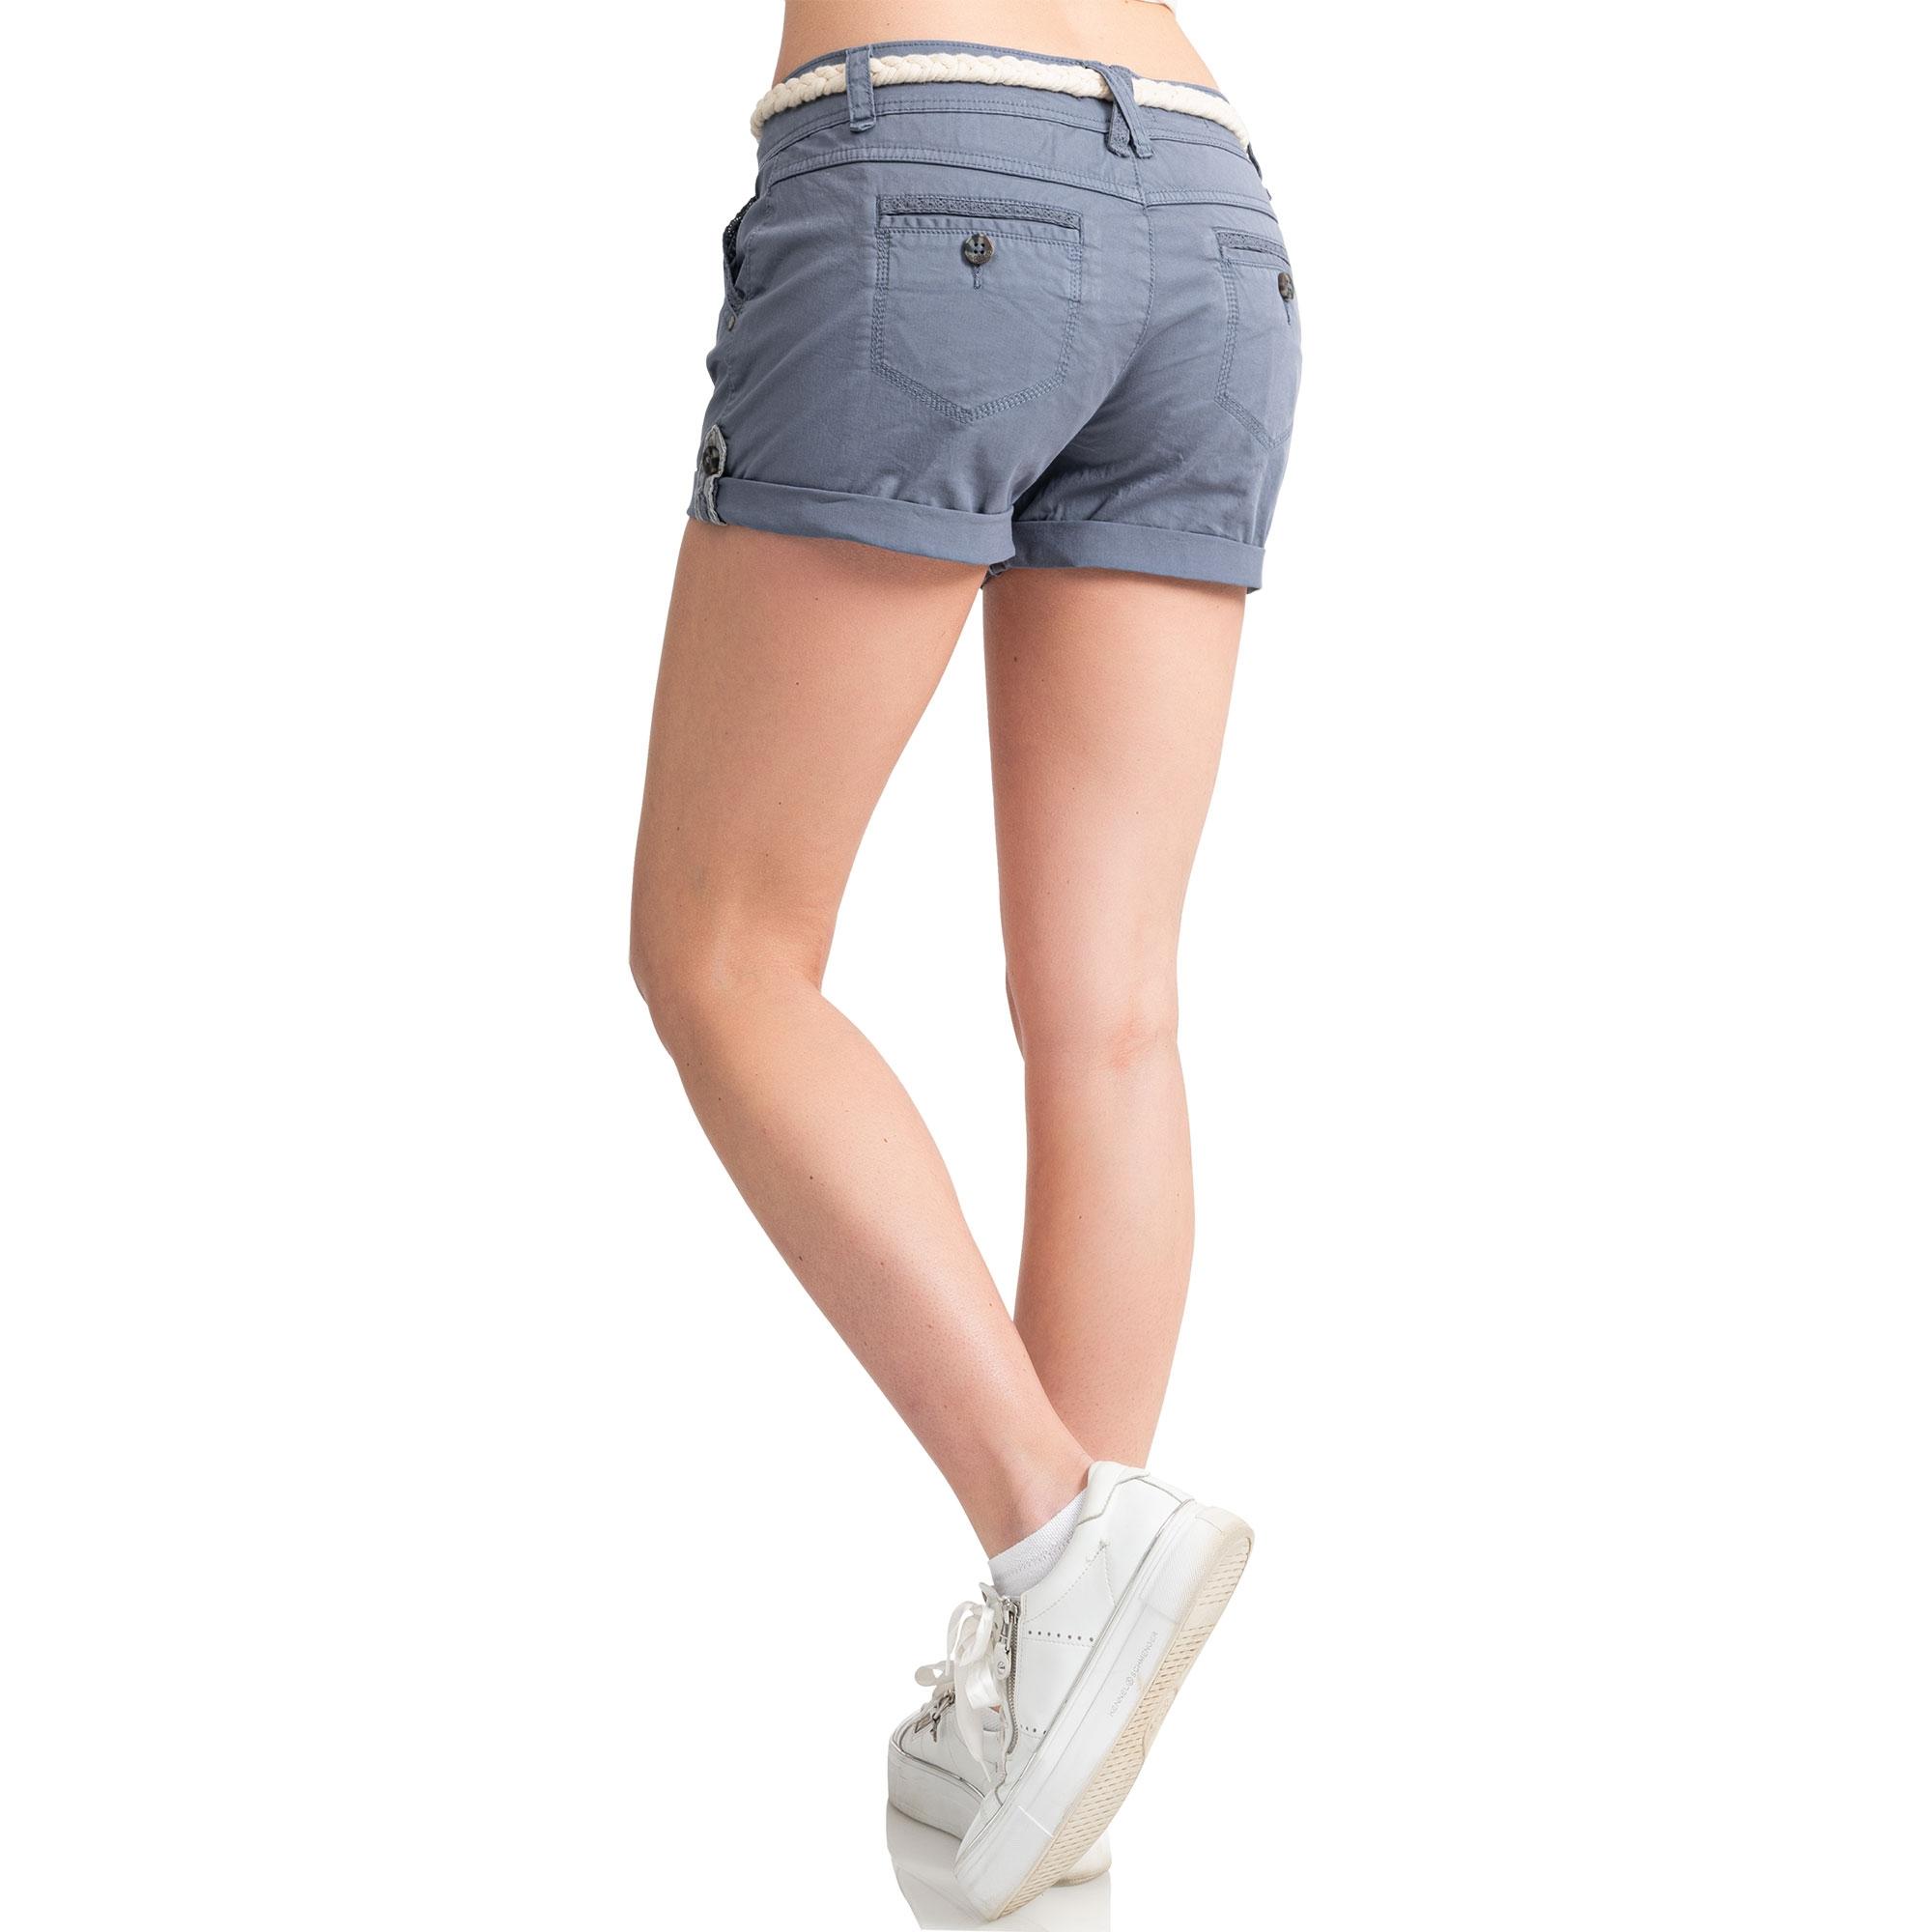 Indexbild 8 - Eight2Nine Damen Chino Bermuda Stretch Shorts mit Flecht Gürtel Hotpants